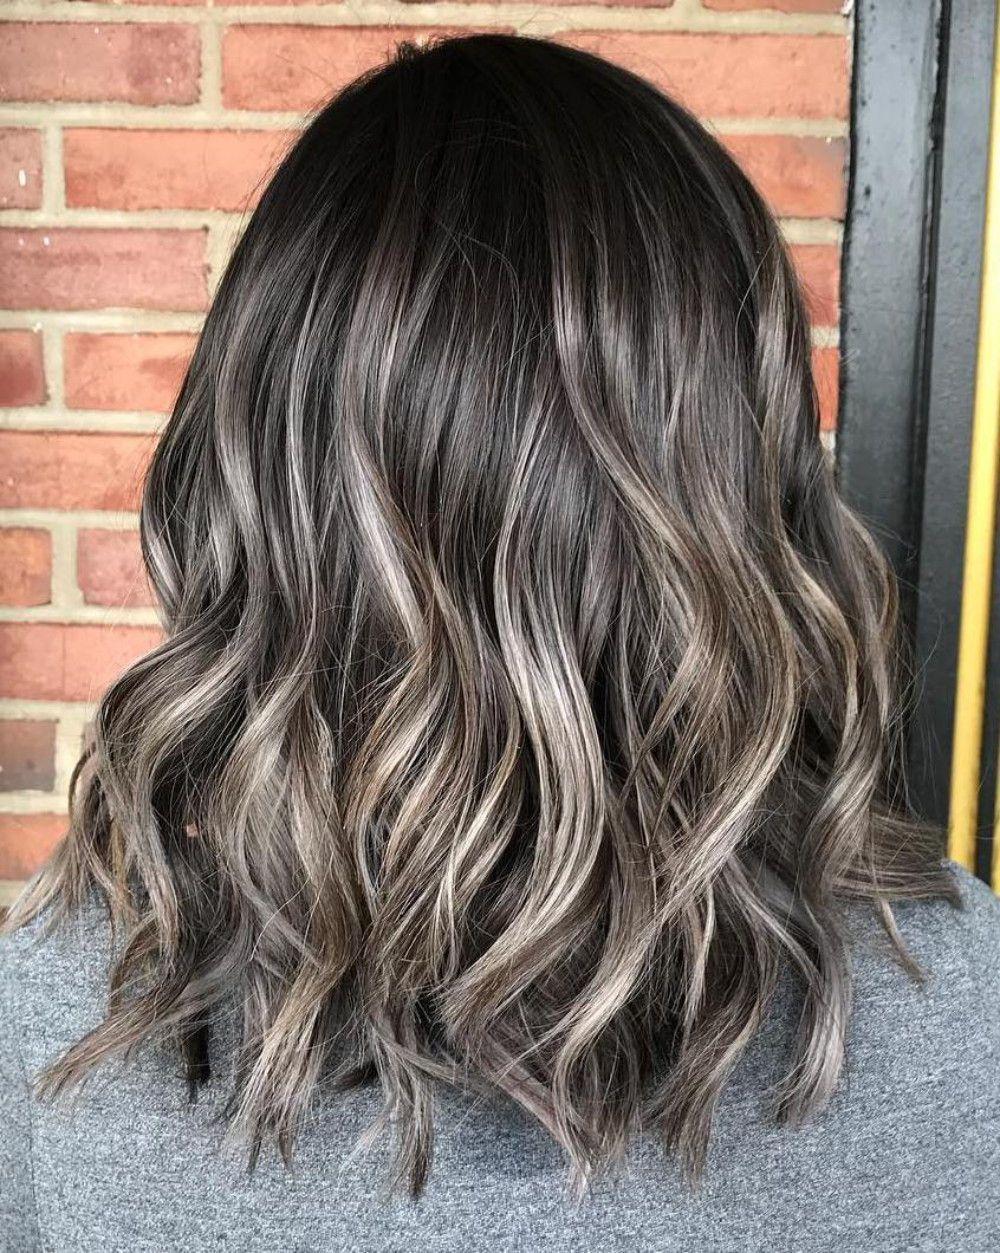 9 Ash blonde balayage ideas   hair styles, hair highlights, balayage